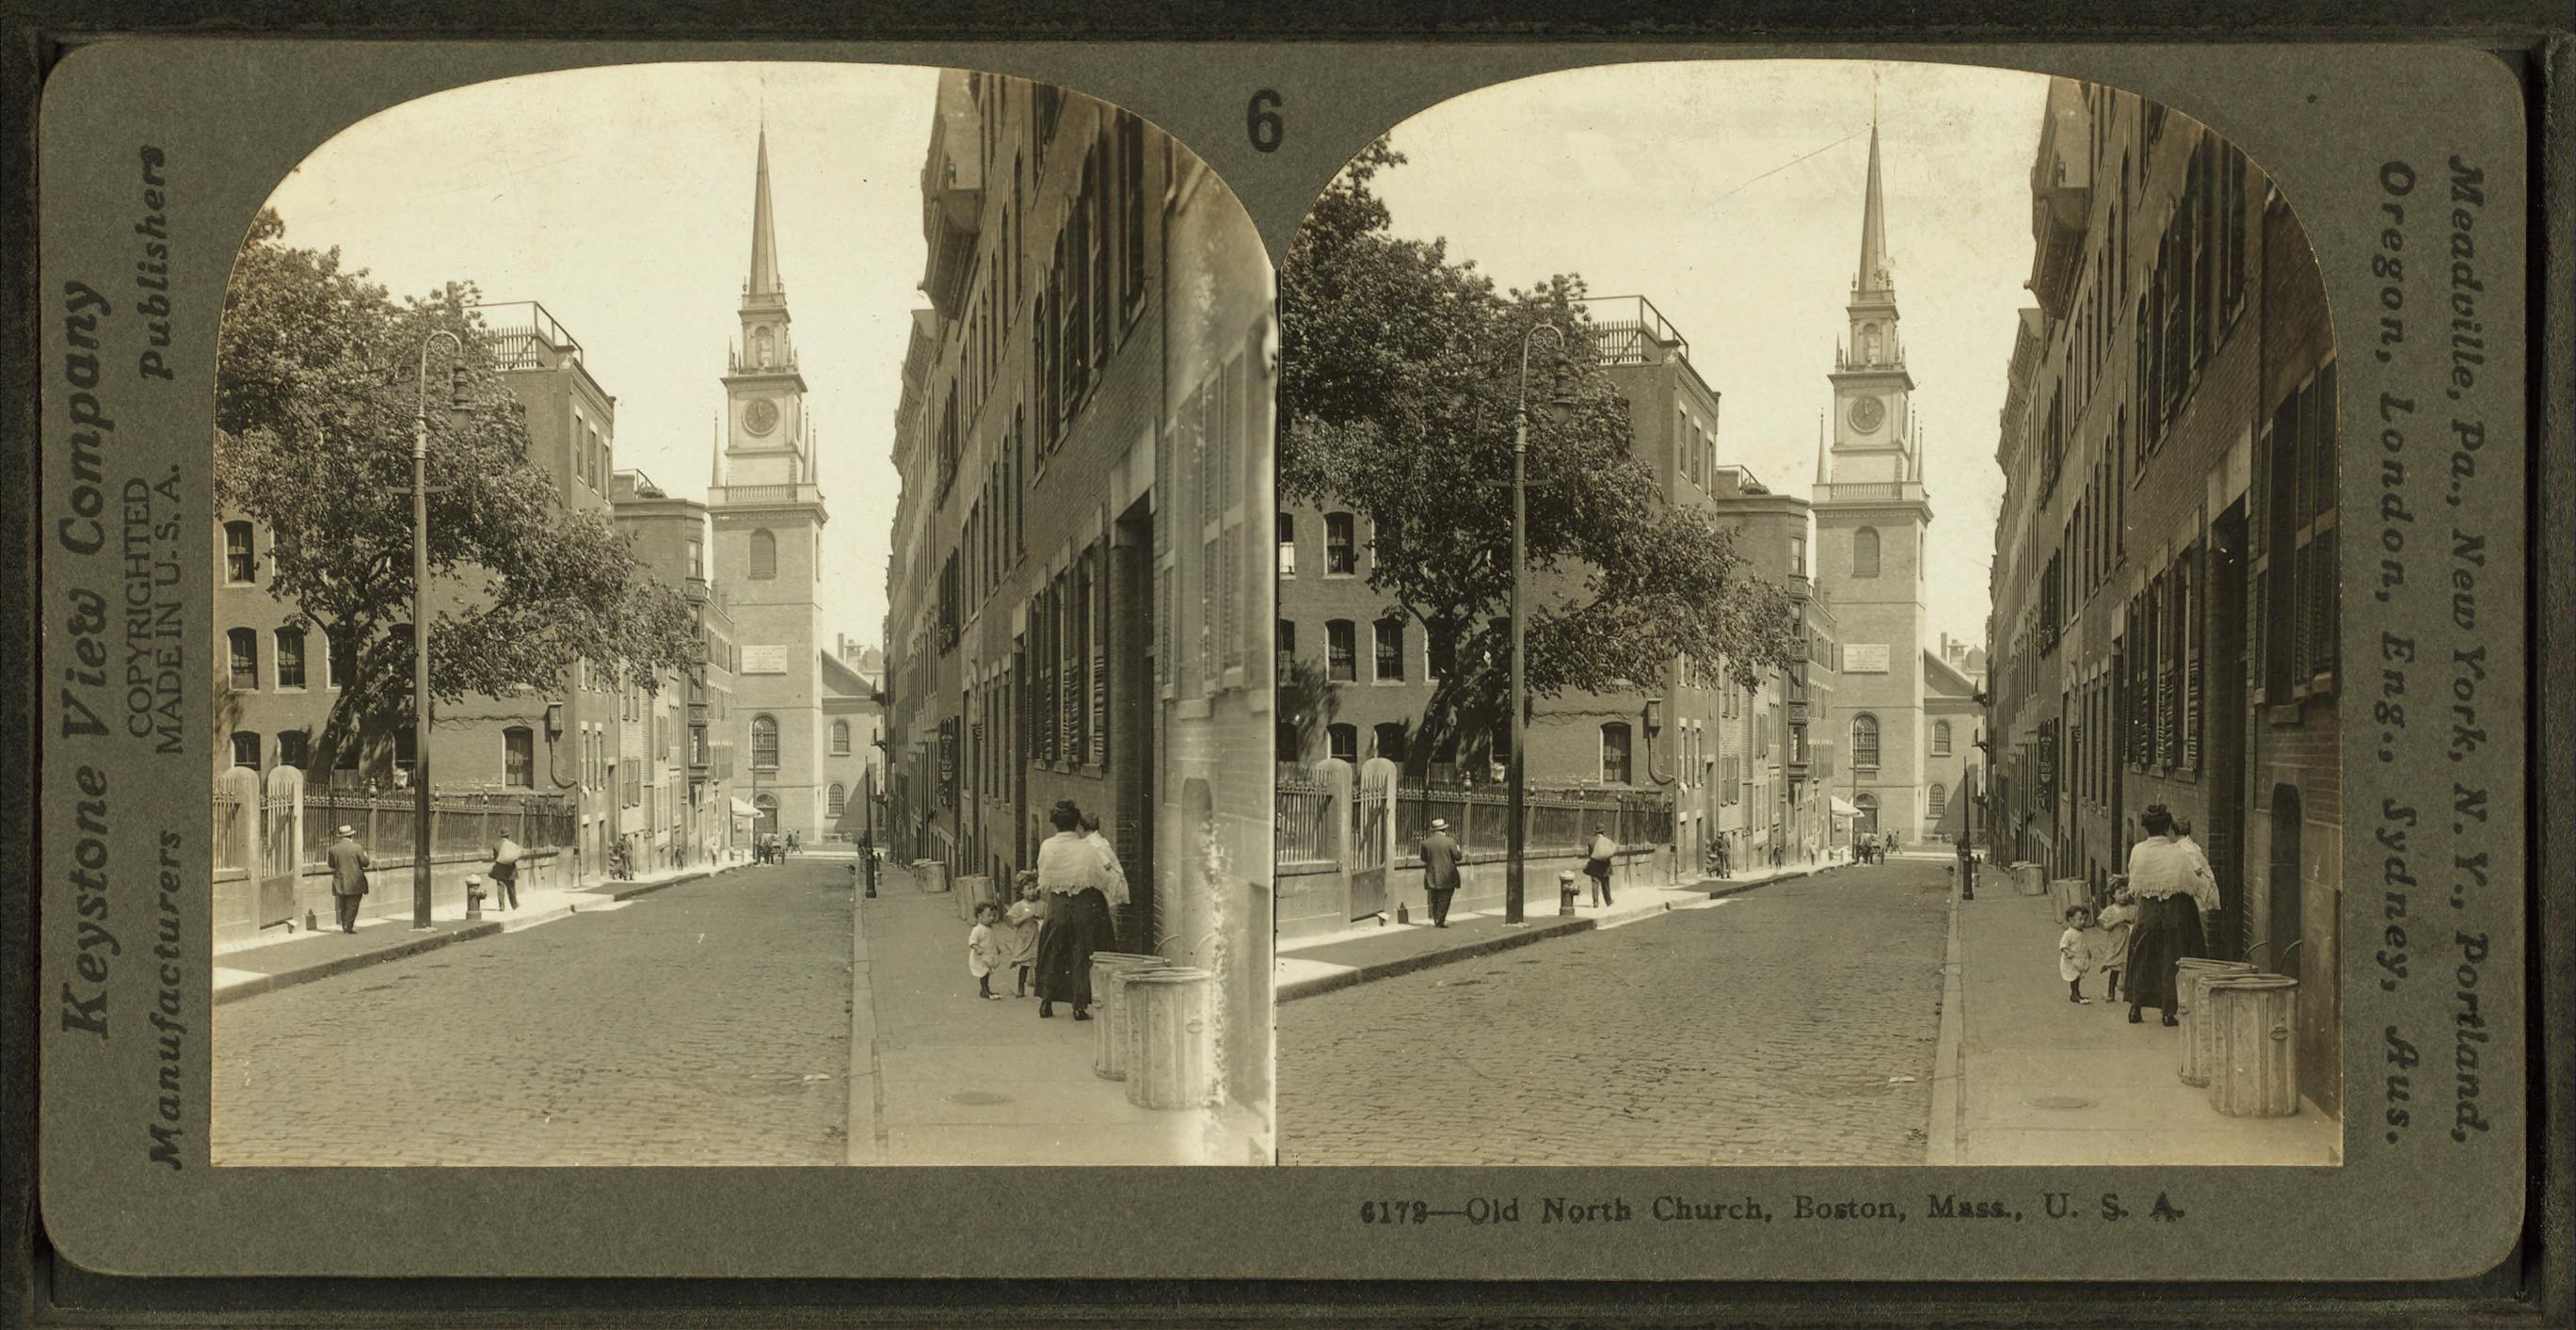 File:Old North Church, Boston, Mass  U S A, by Keystone View